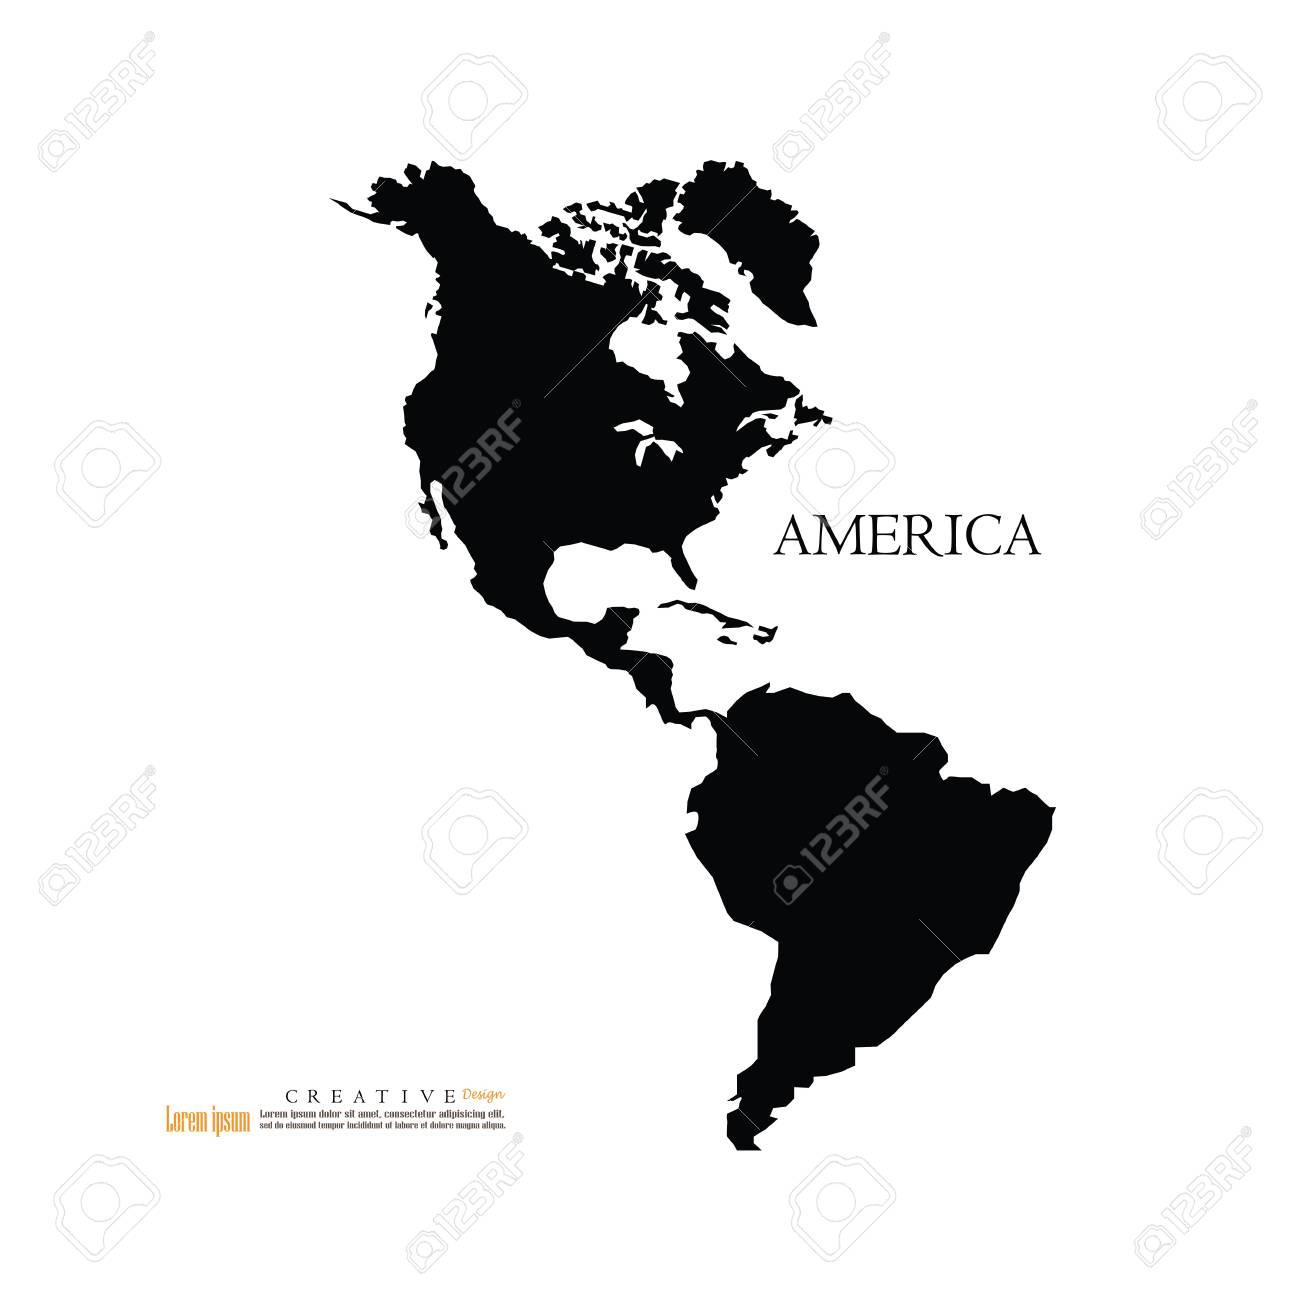 america continent map north